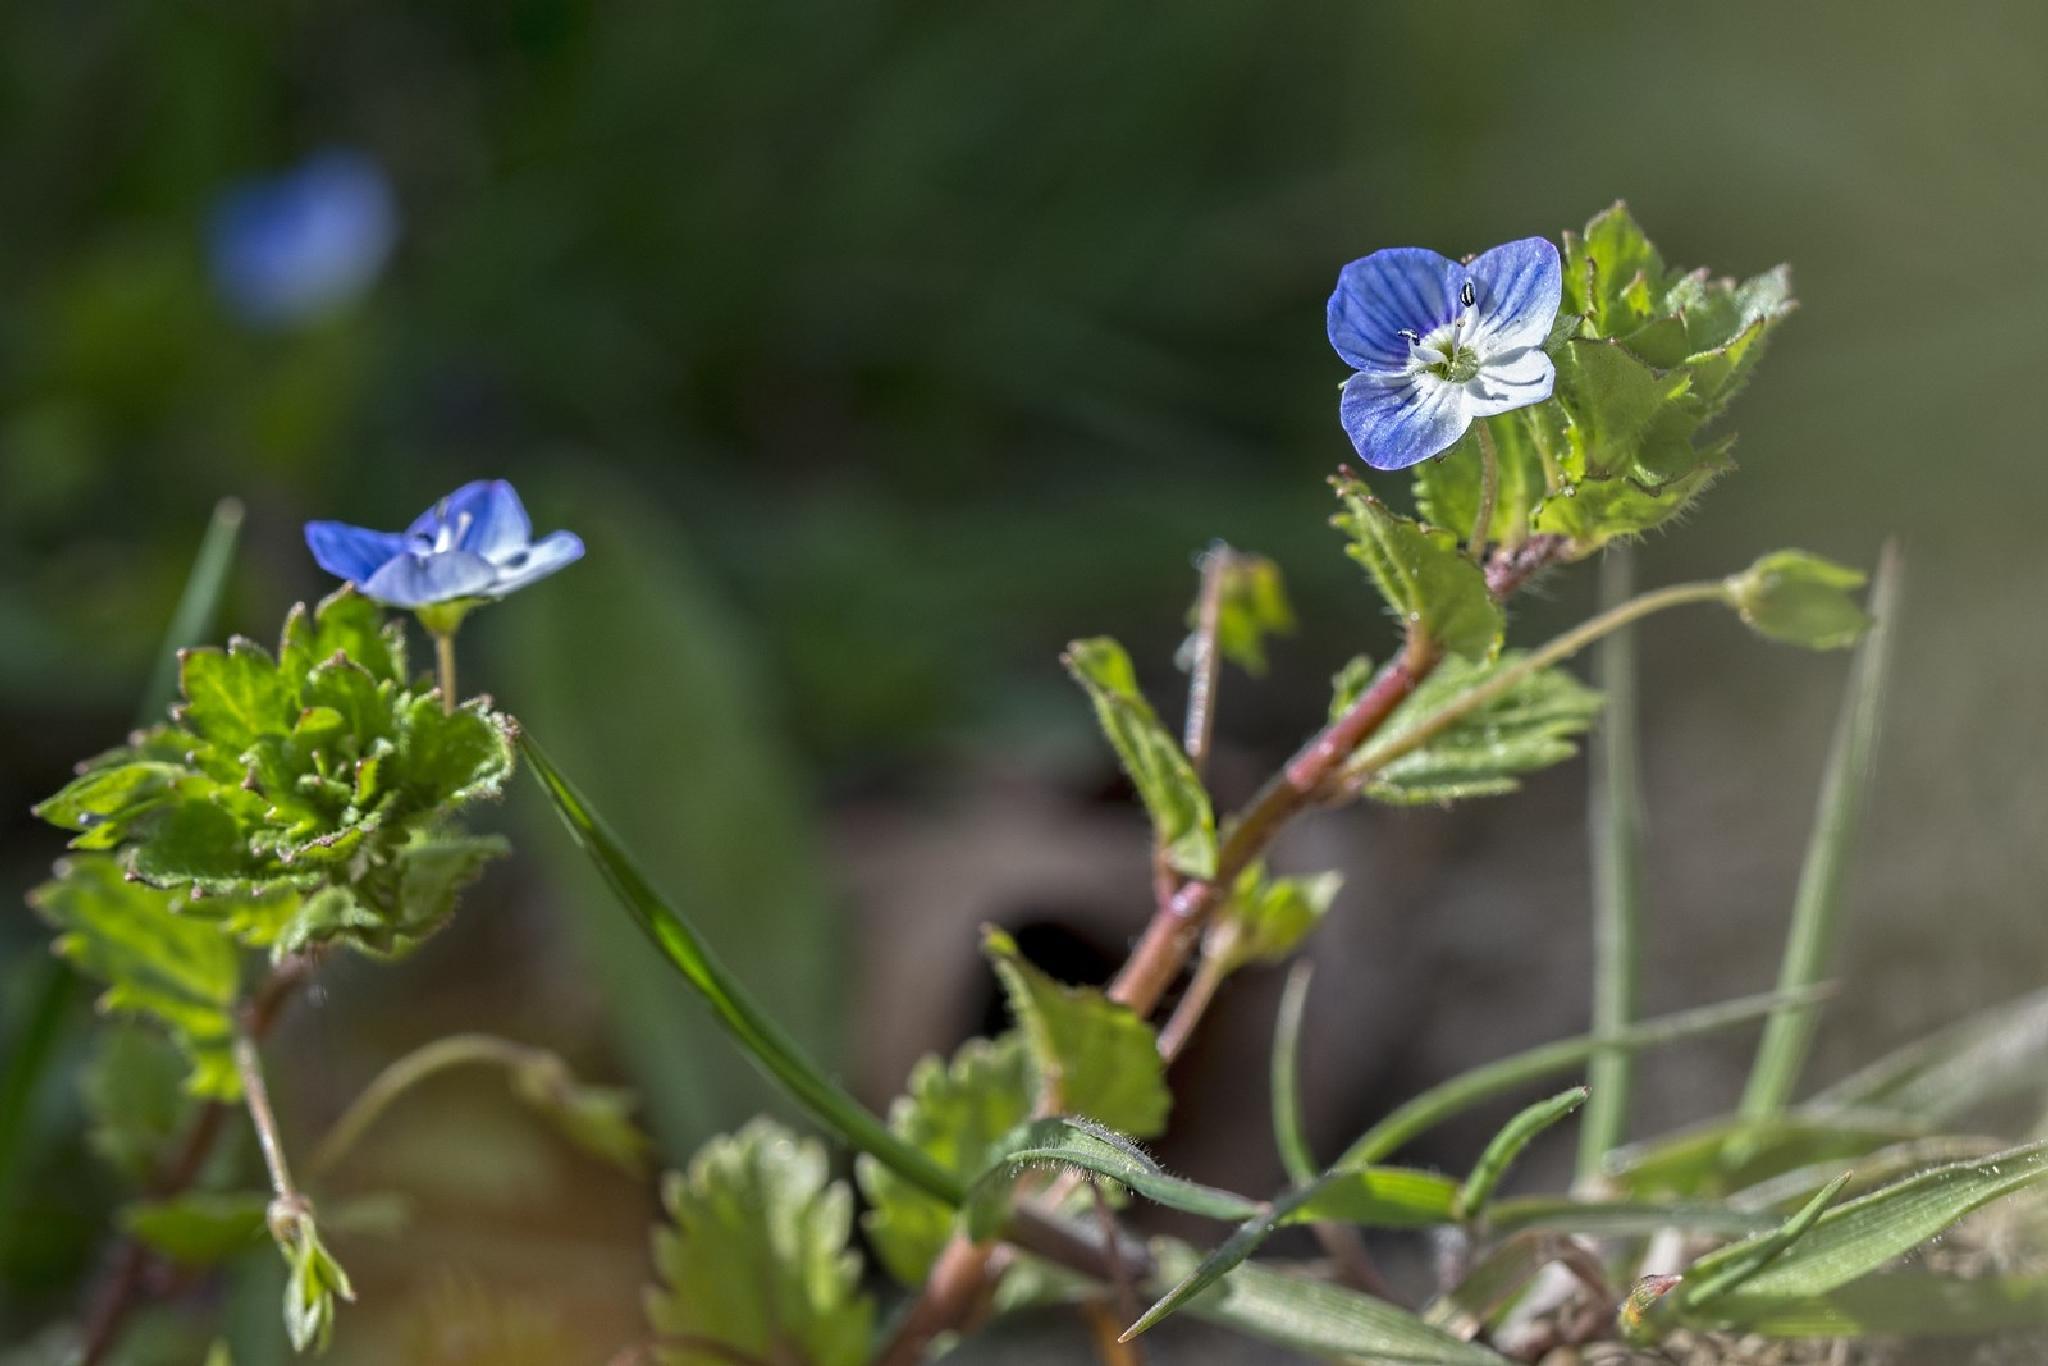 Spring Macro_14 by Waldemar Sadlowski